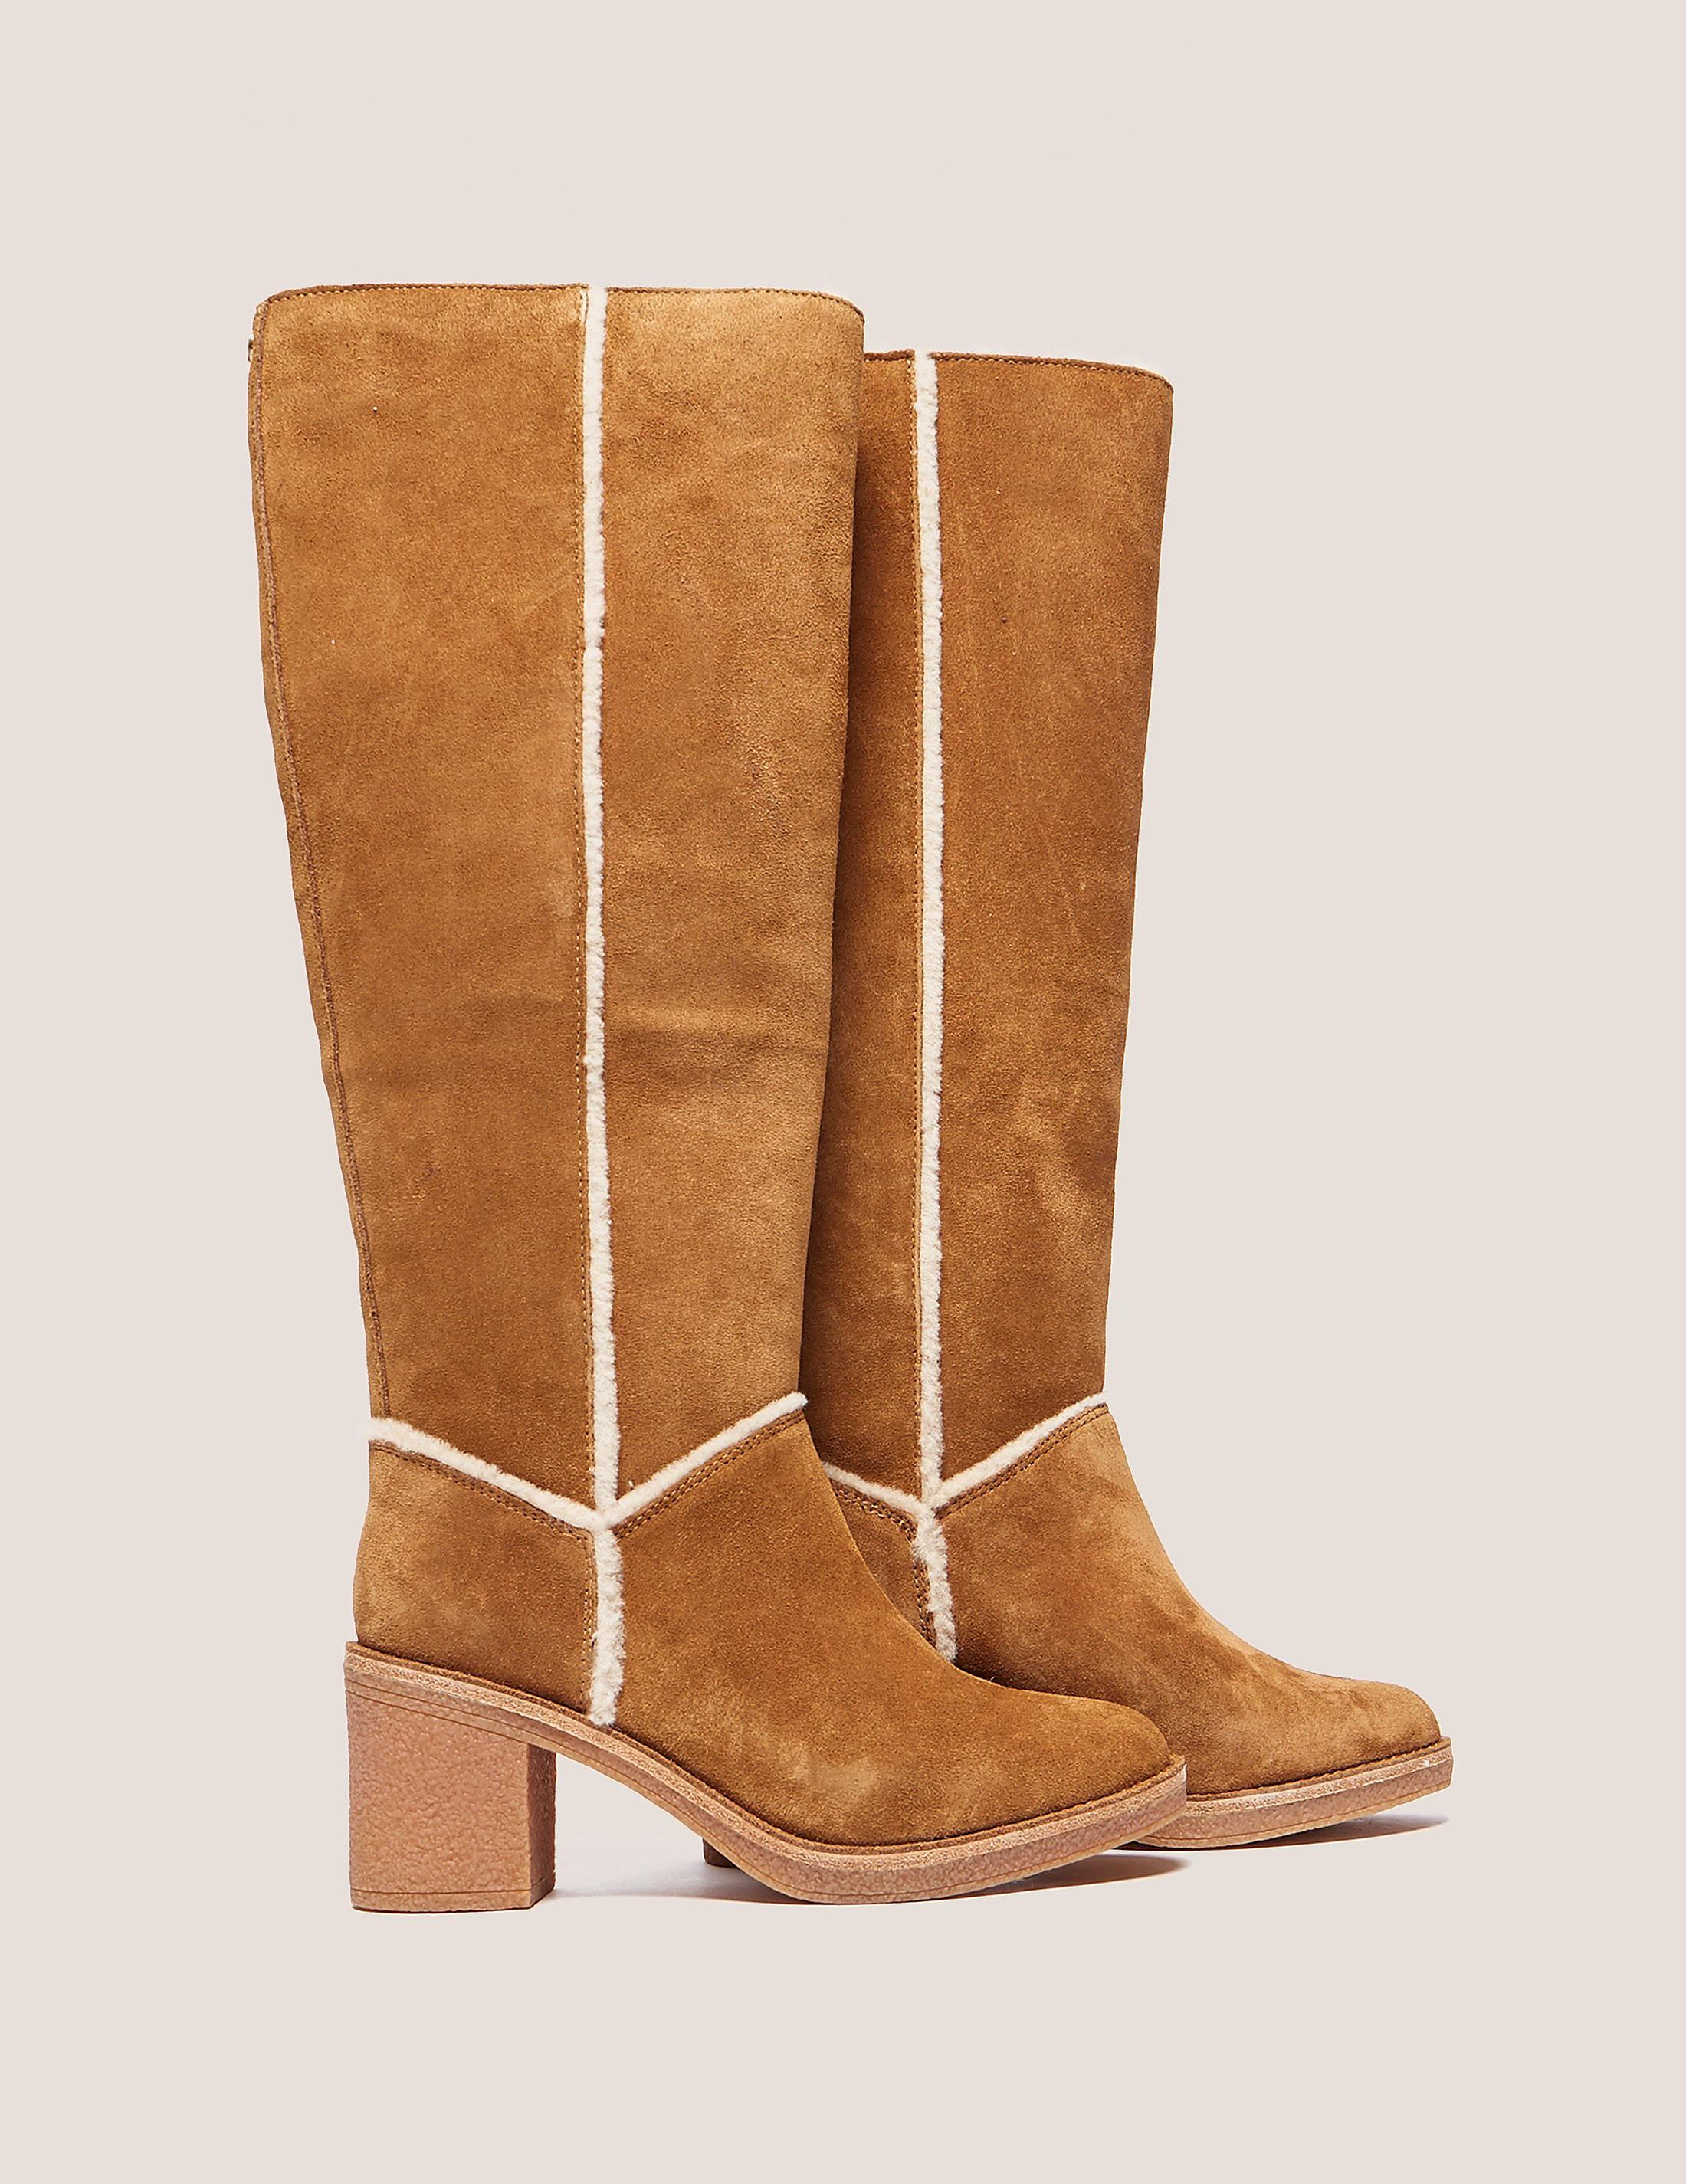 UGG Kasen Tall Boots - Online Exclusive